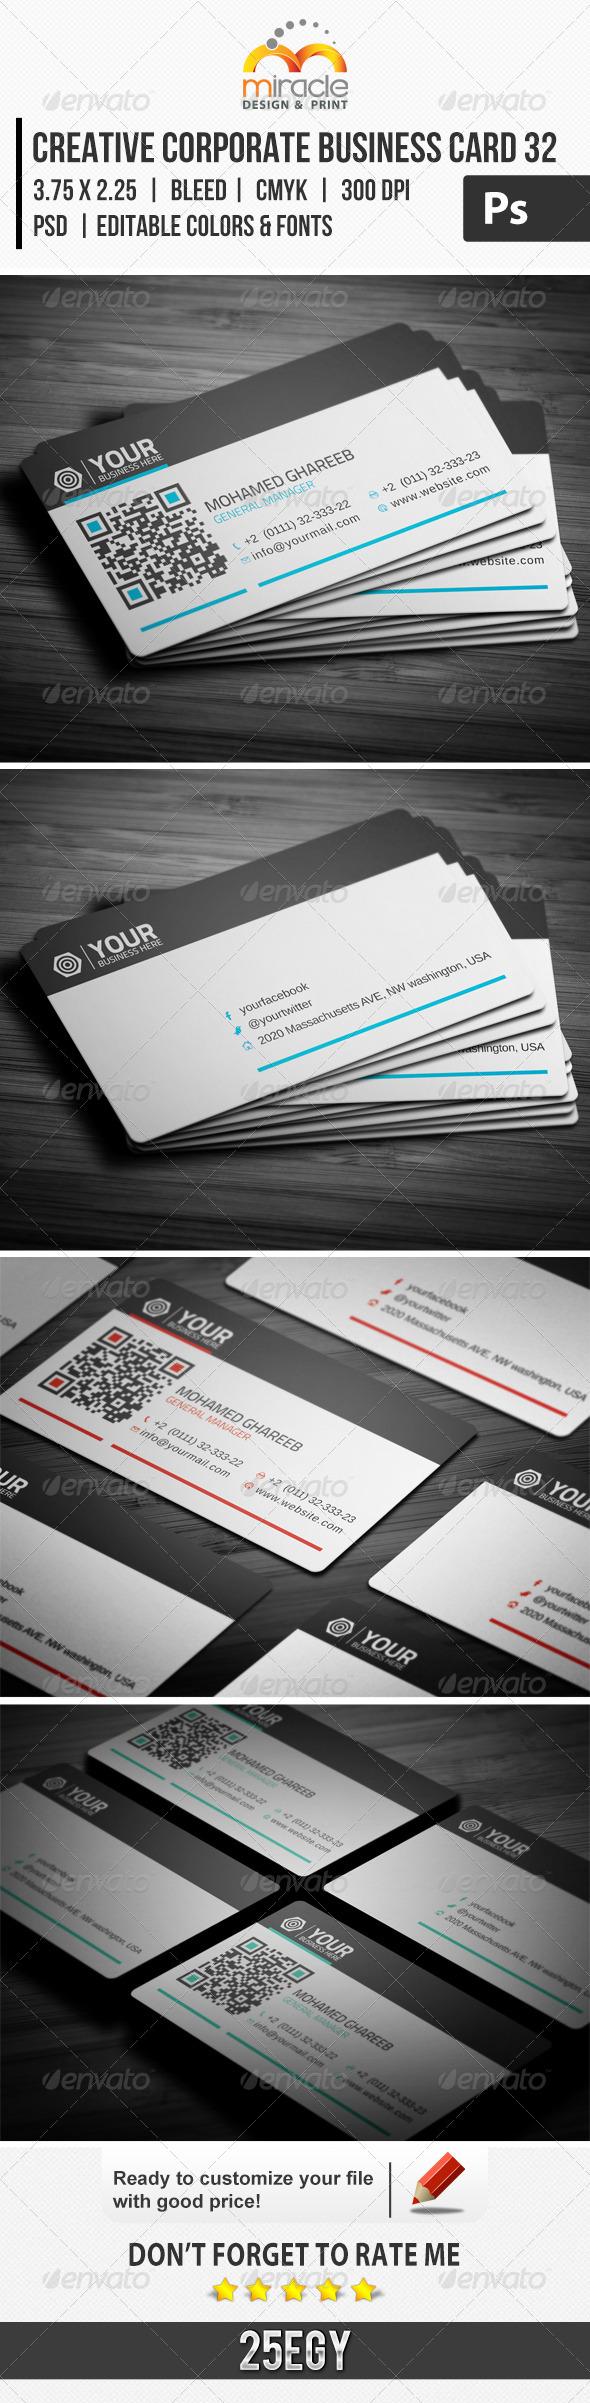 Creative Corporate Business Card 32 - Corporate Business Cards